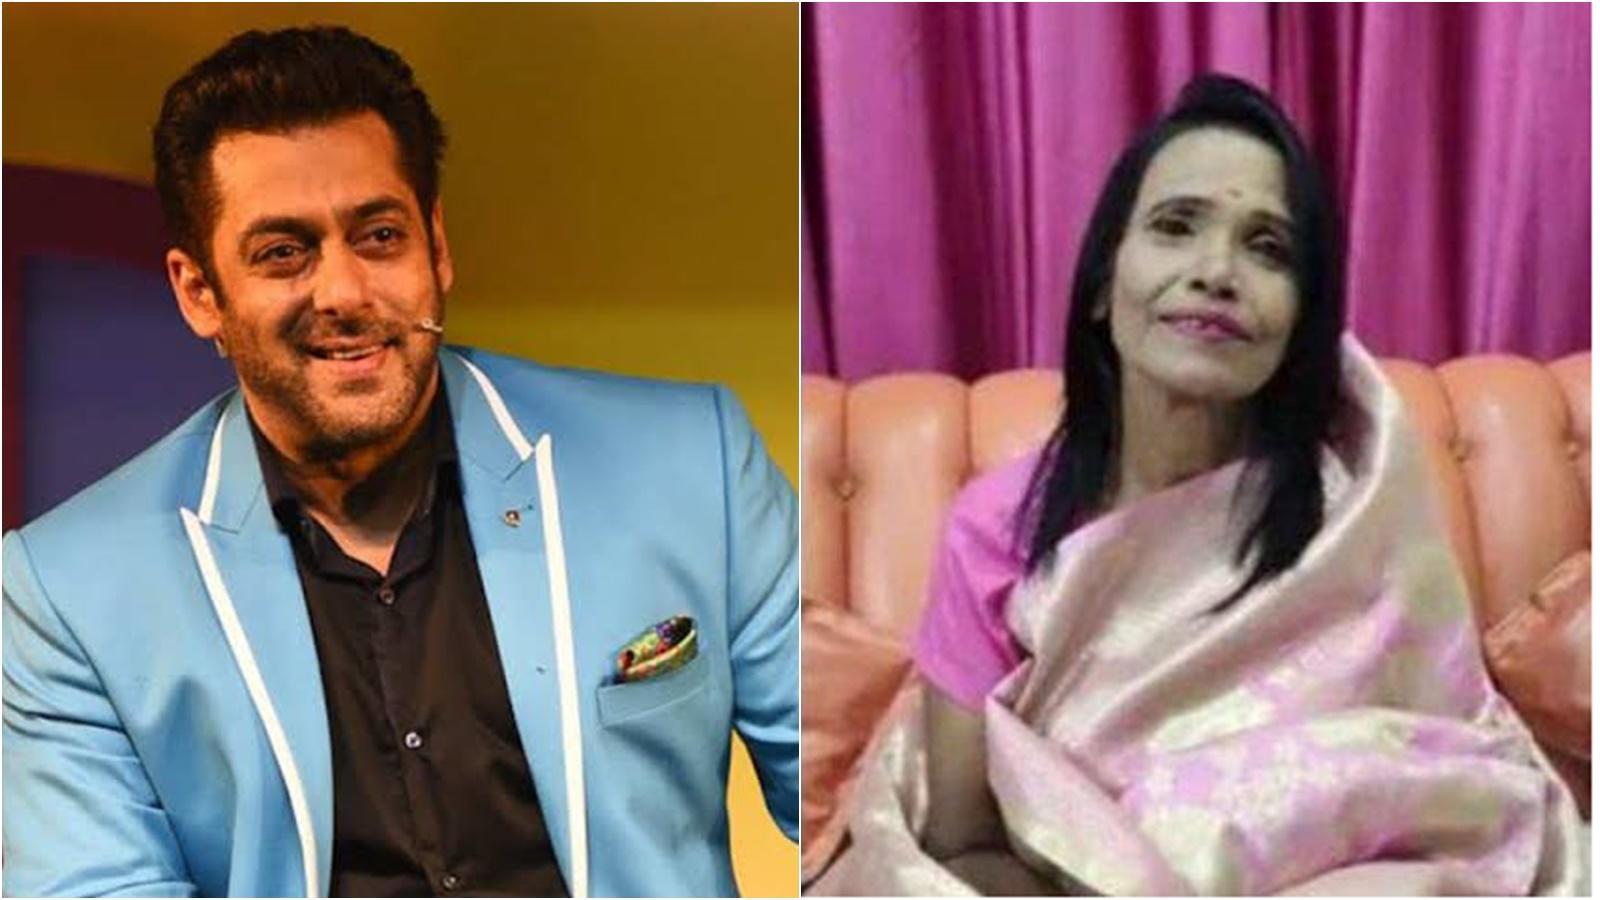 Has Salman Khan gifted internet sensation Ranu Mondal a house worth Rs 55  lakh in Mumbai? Here's the truth